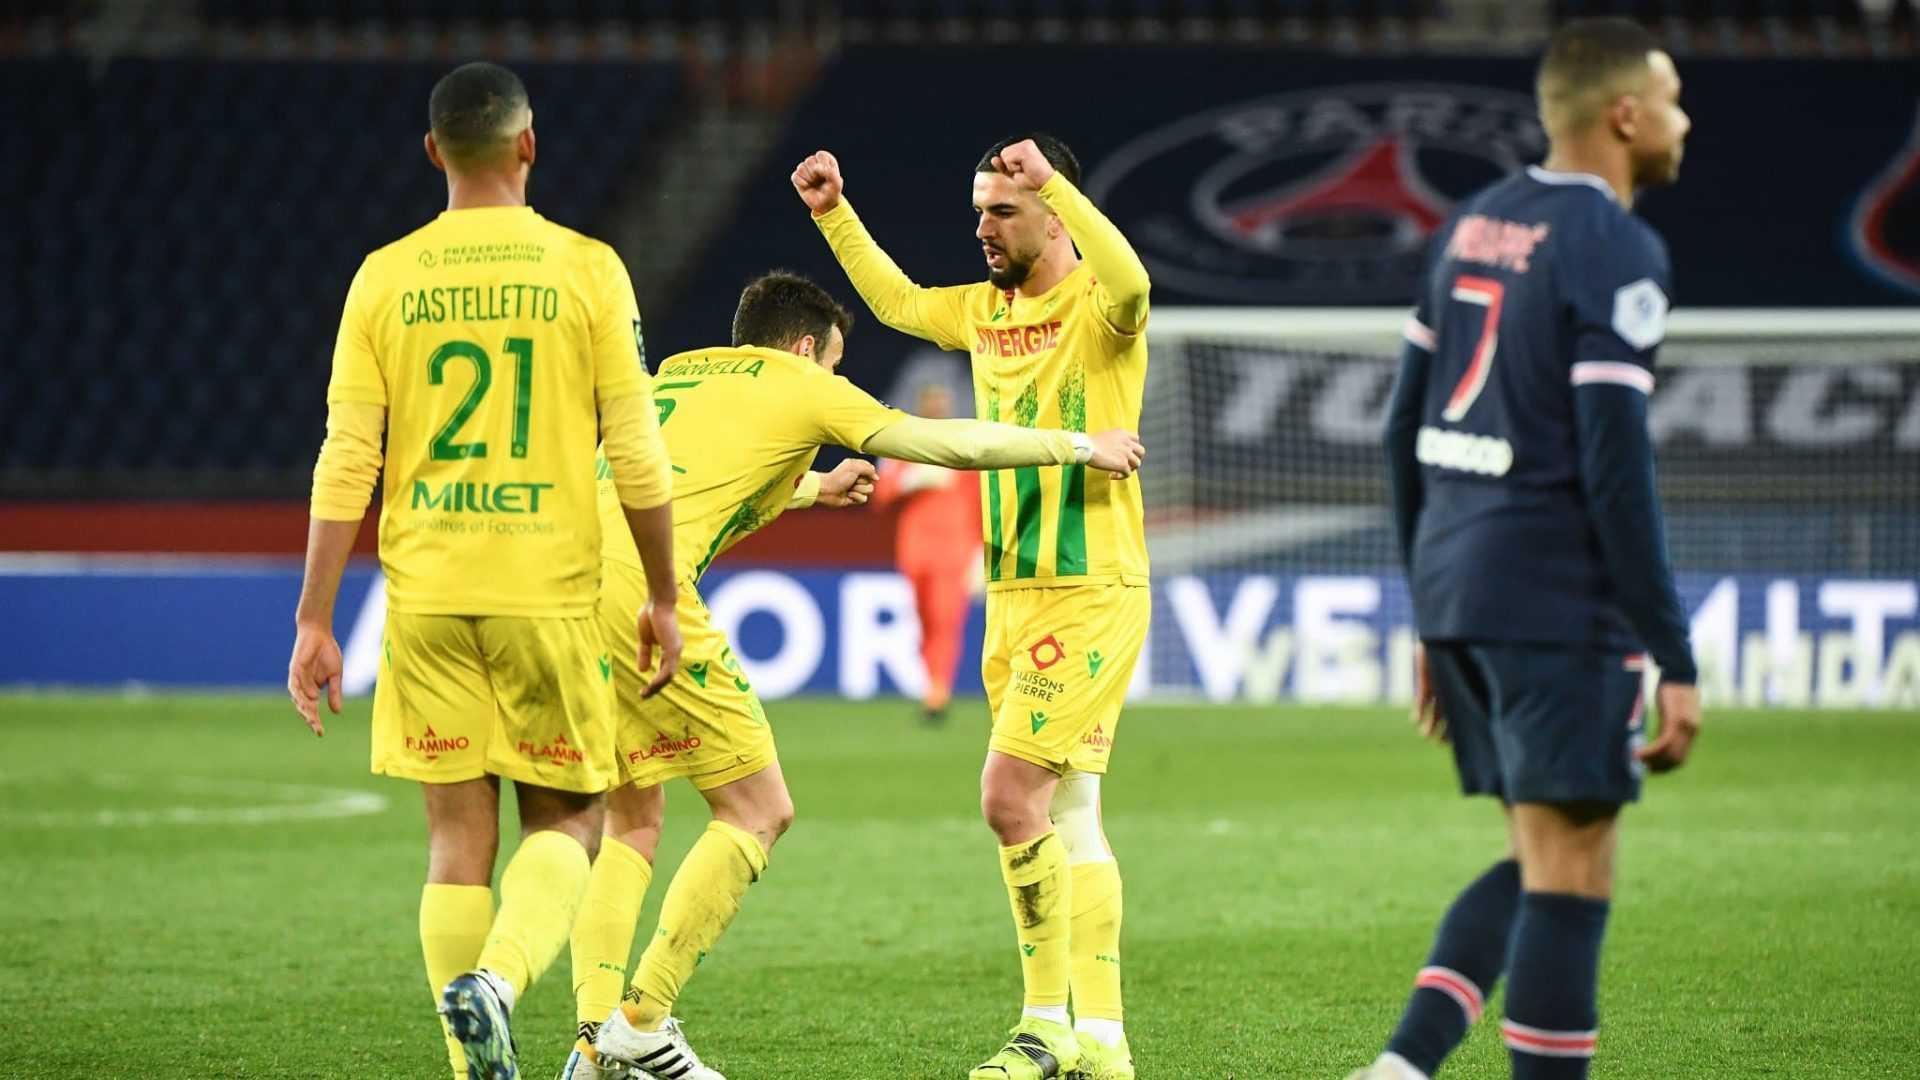 Ligue 1, giornata 29: il Nantes sbanca Parigi, Monaco-Lille 0-0